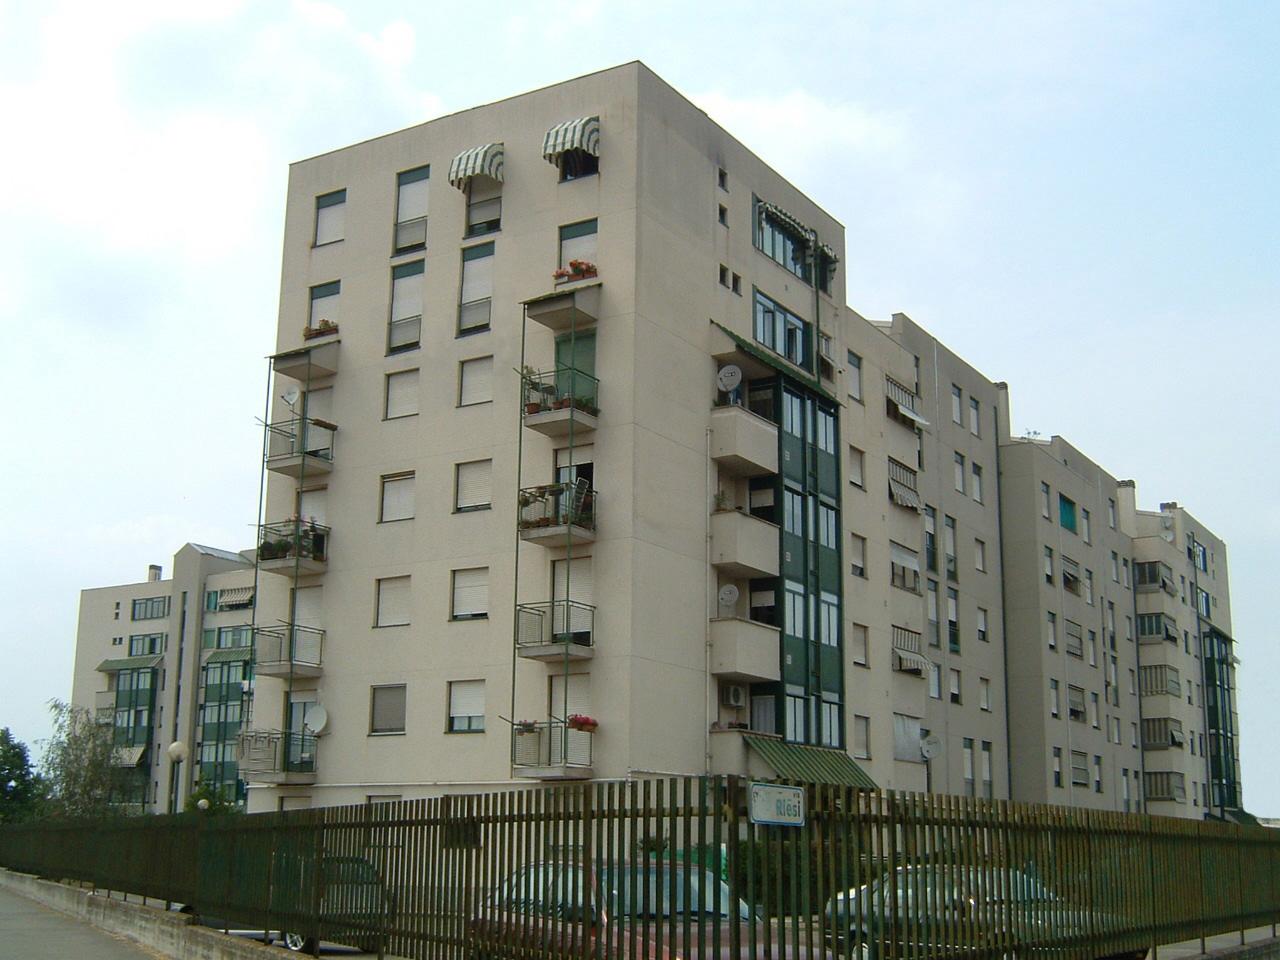 Studio d 39 a arch d 39 angelo edifici residenziali a for Progettazione di edifici residenziali